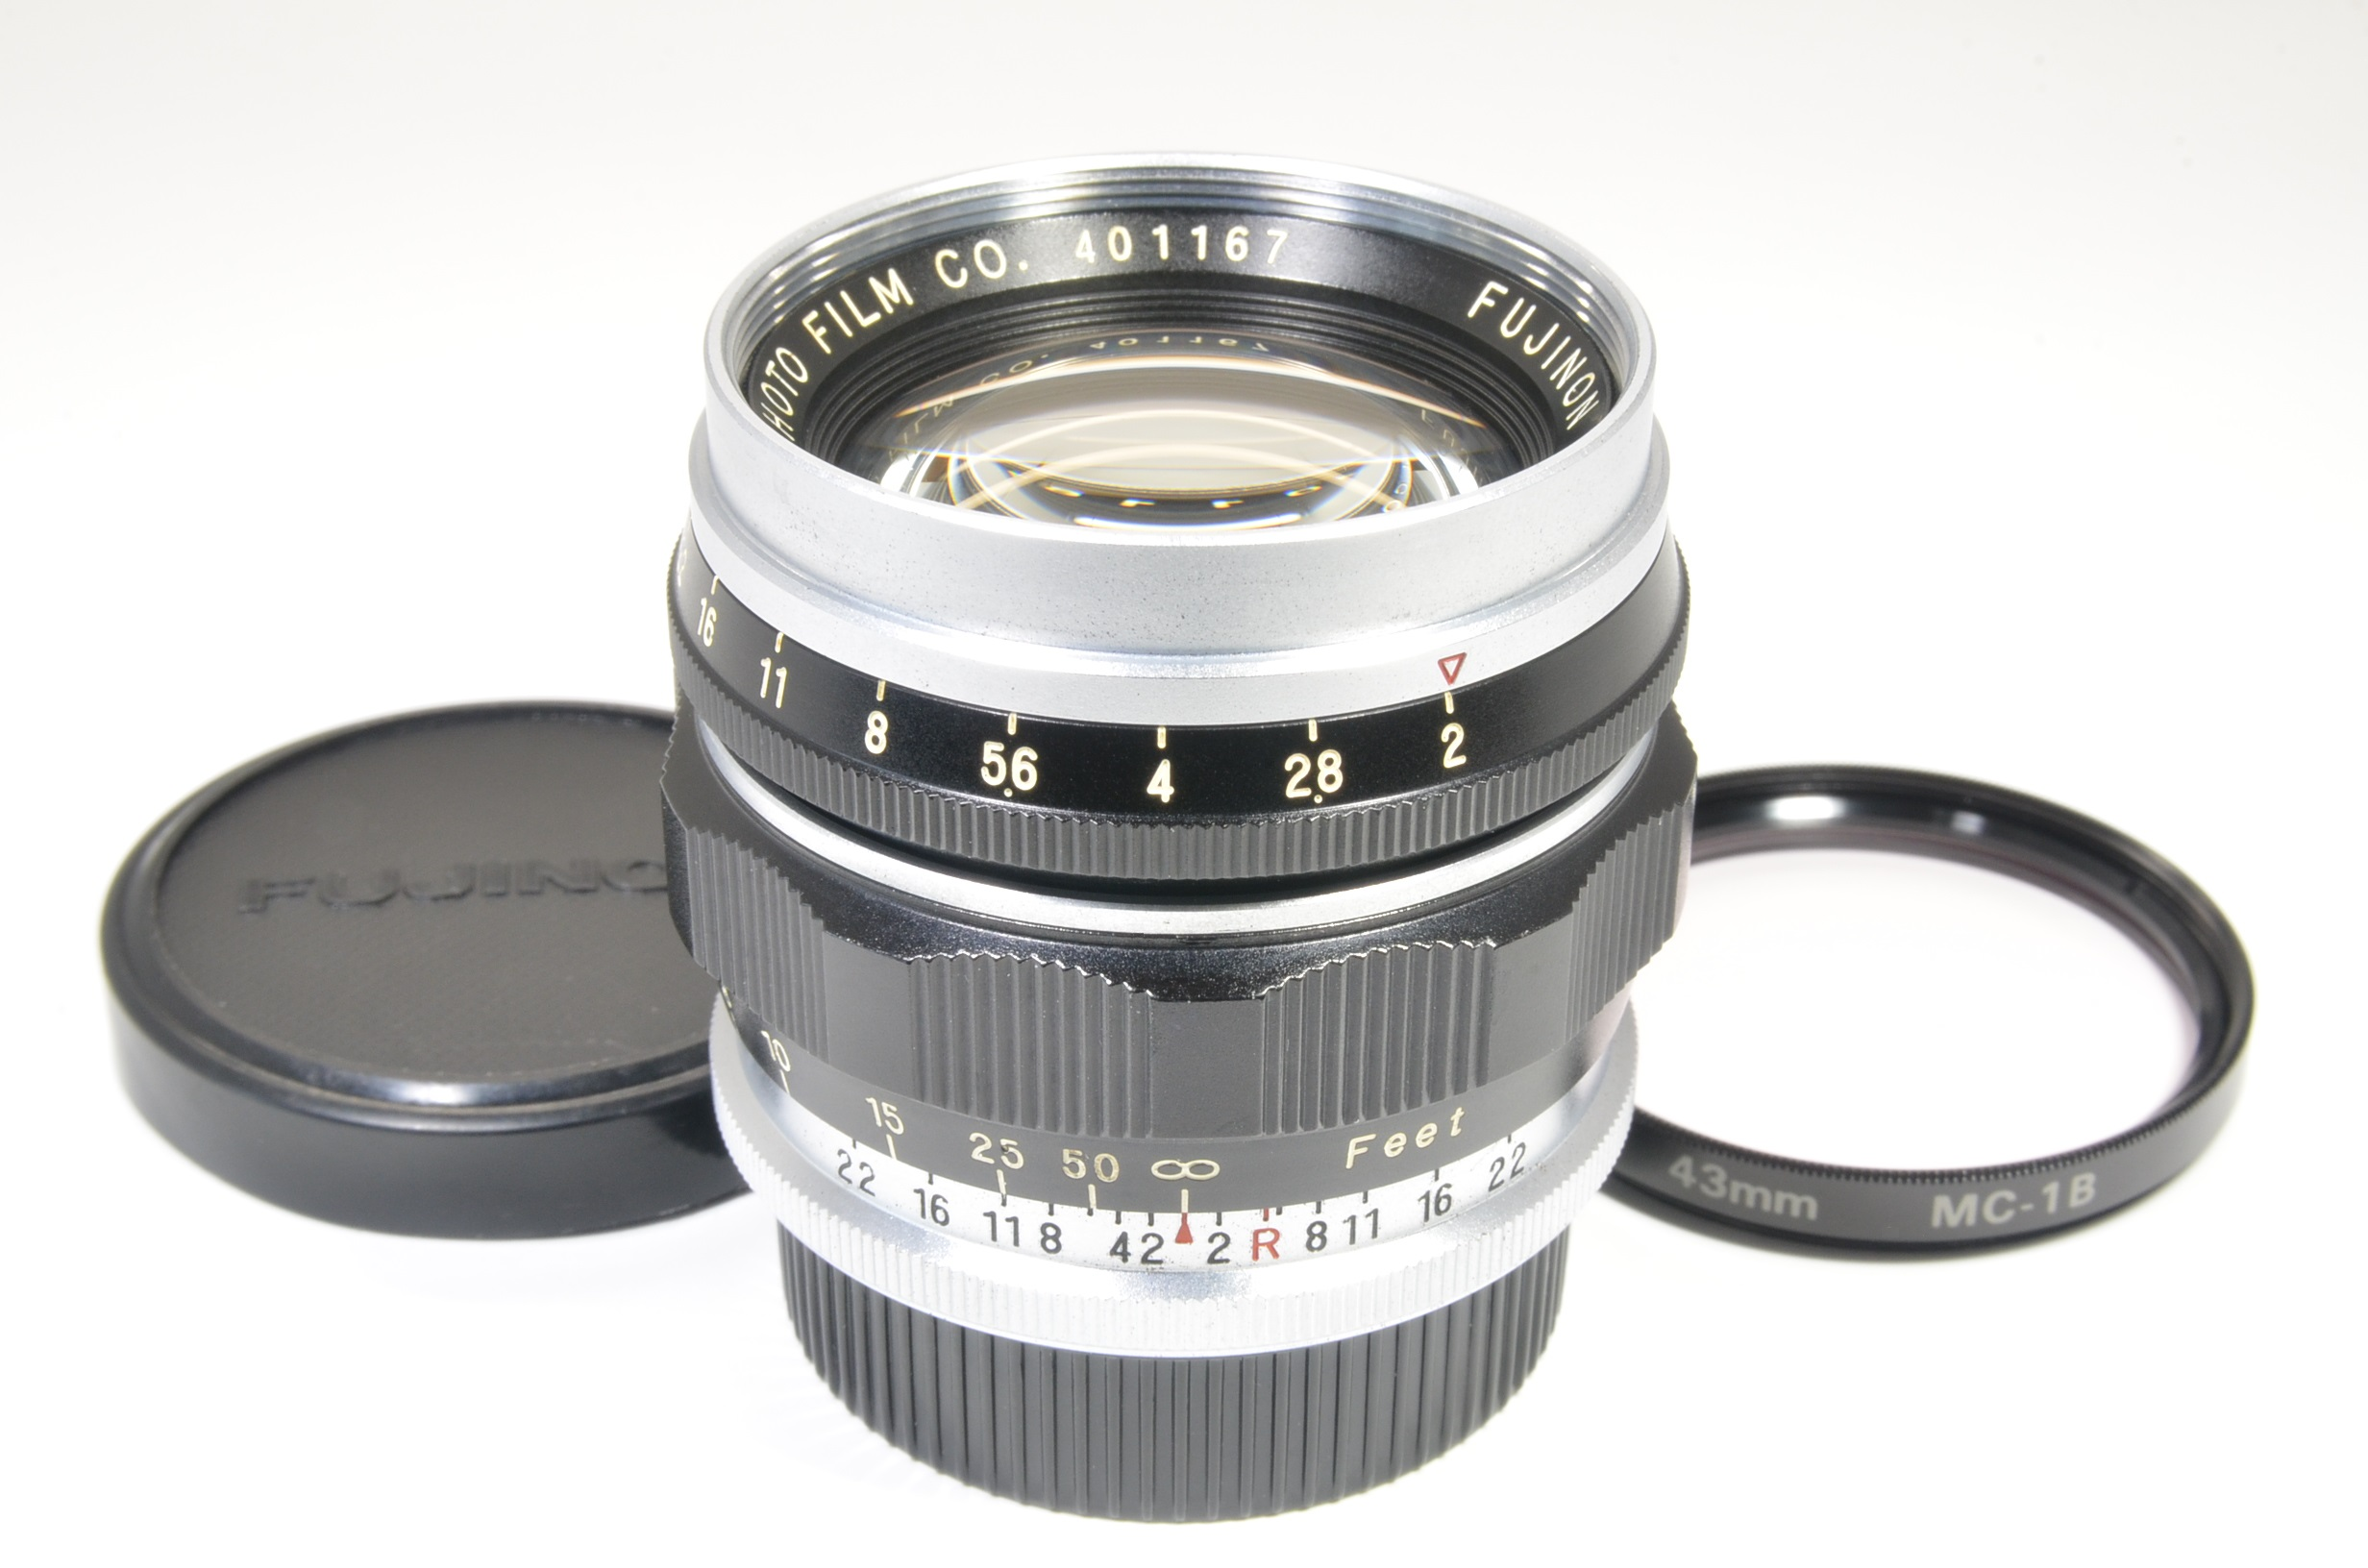 fuji fujinon 50mm 5cm f2 l mount lens for leica m39 l39 ltm shooting tested